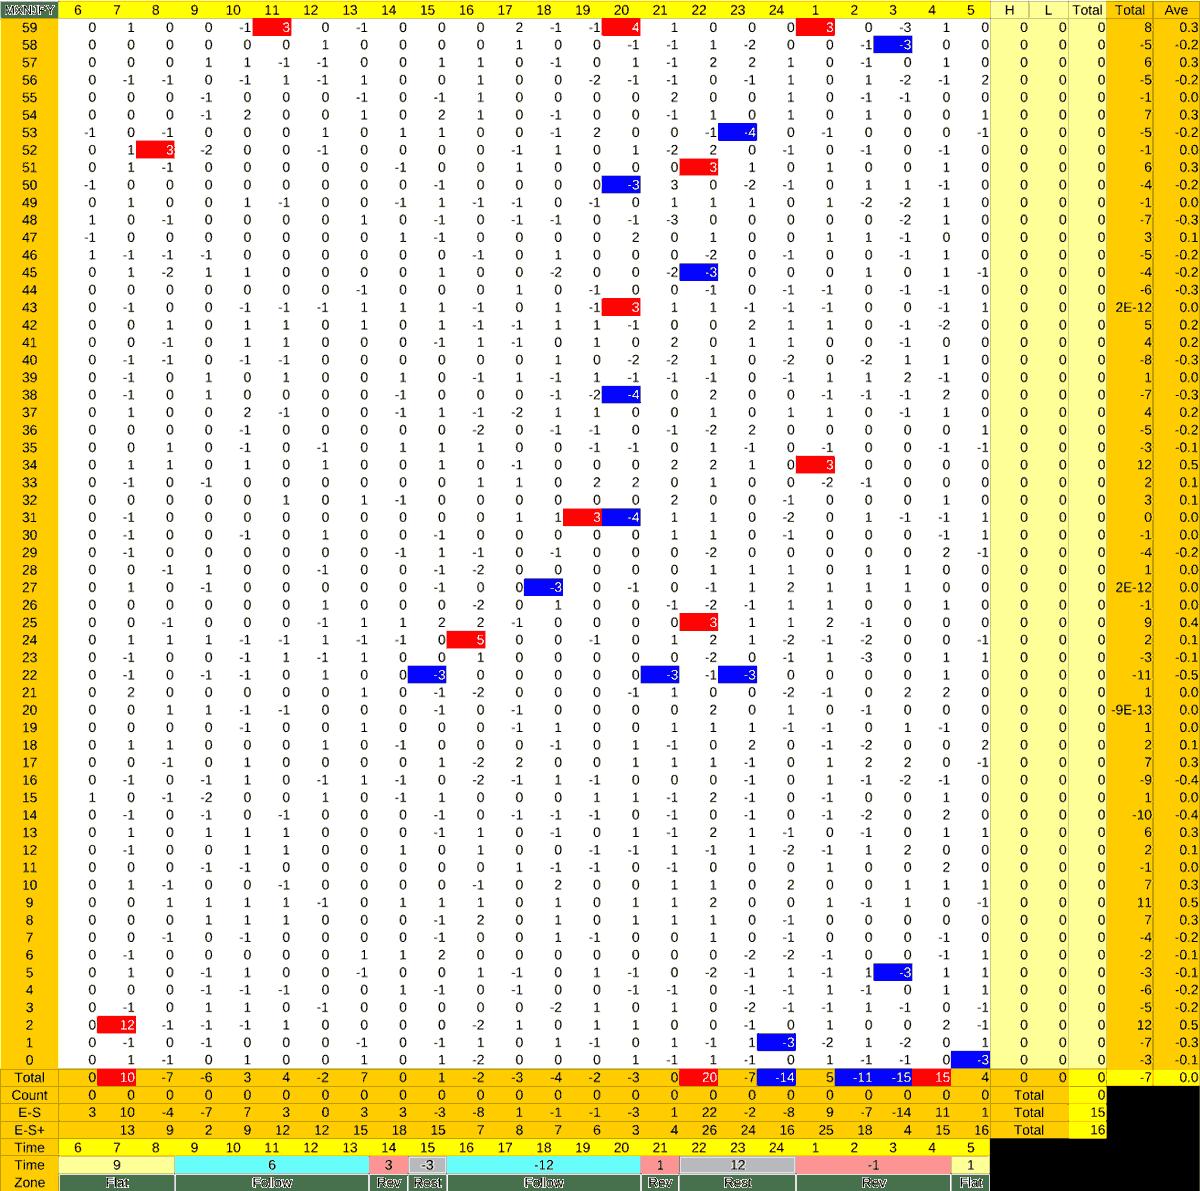 20210414_HS(3)MXNJPY